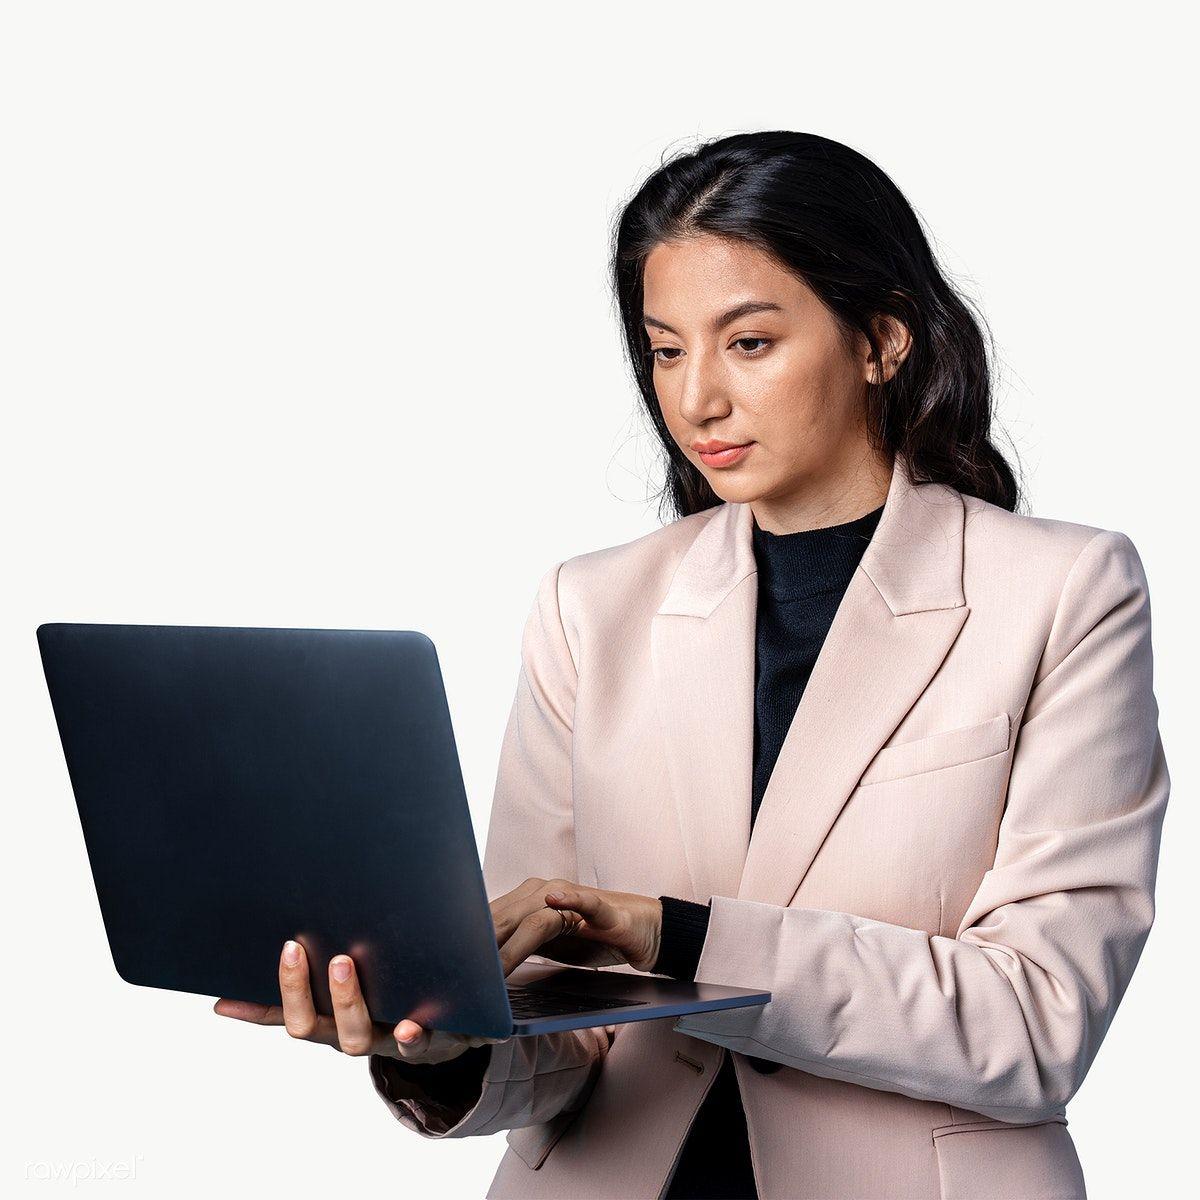 Businesswoman Using A Laptop Transparent Png Premium Image By Rawpixel Com Teddy Rawpixel Business Women Png Victorian Men